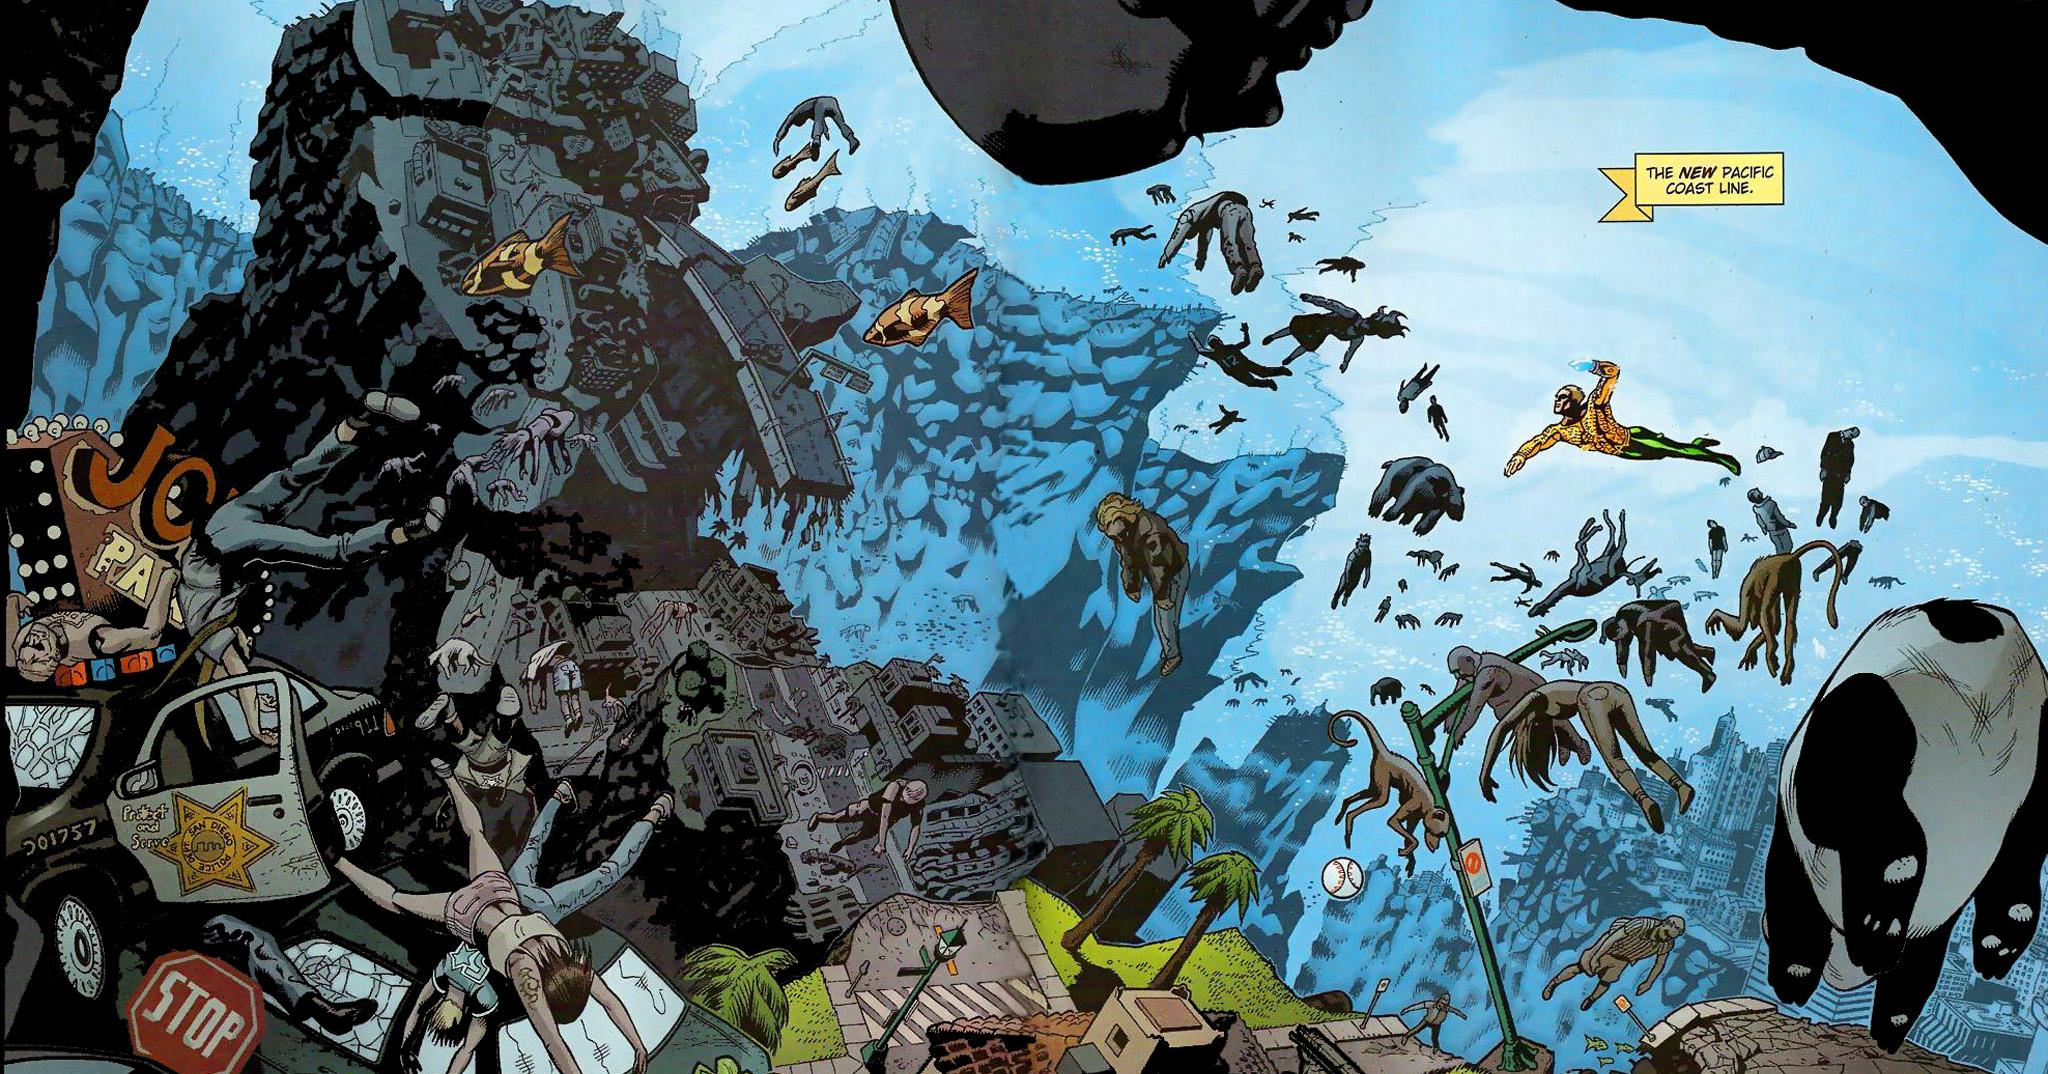 Las 5 mejores historias de Aquaman en los comics